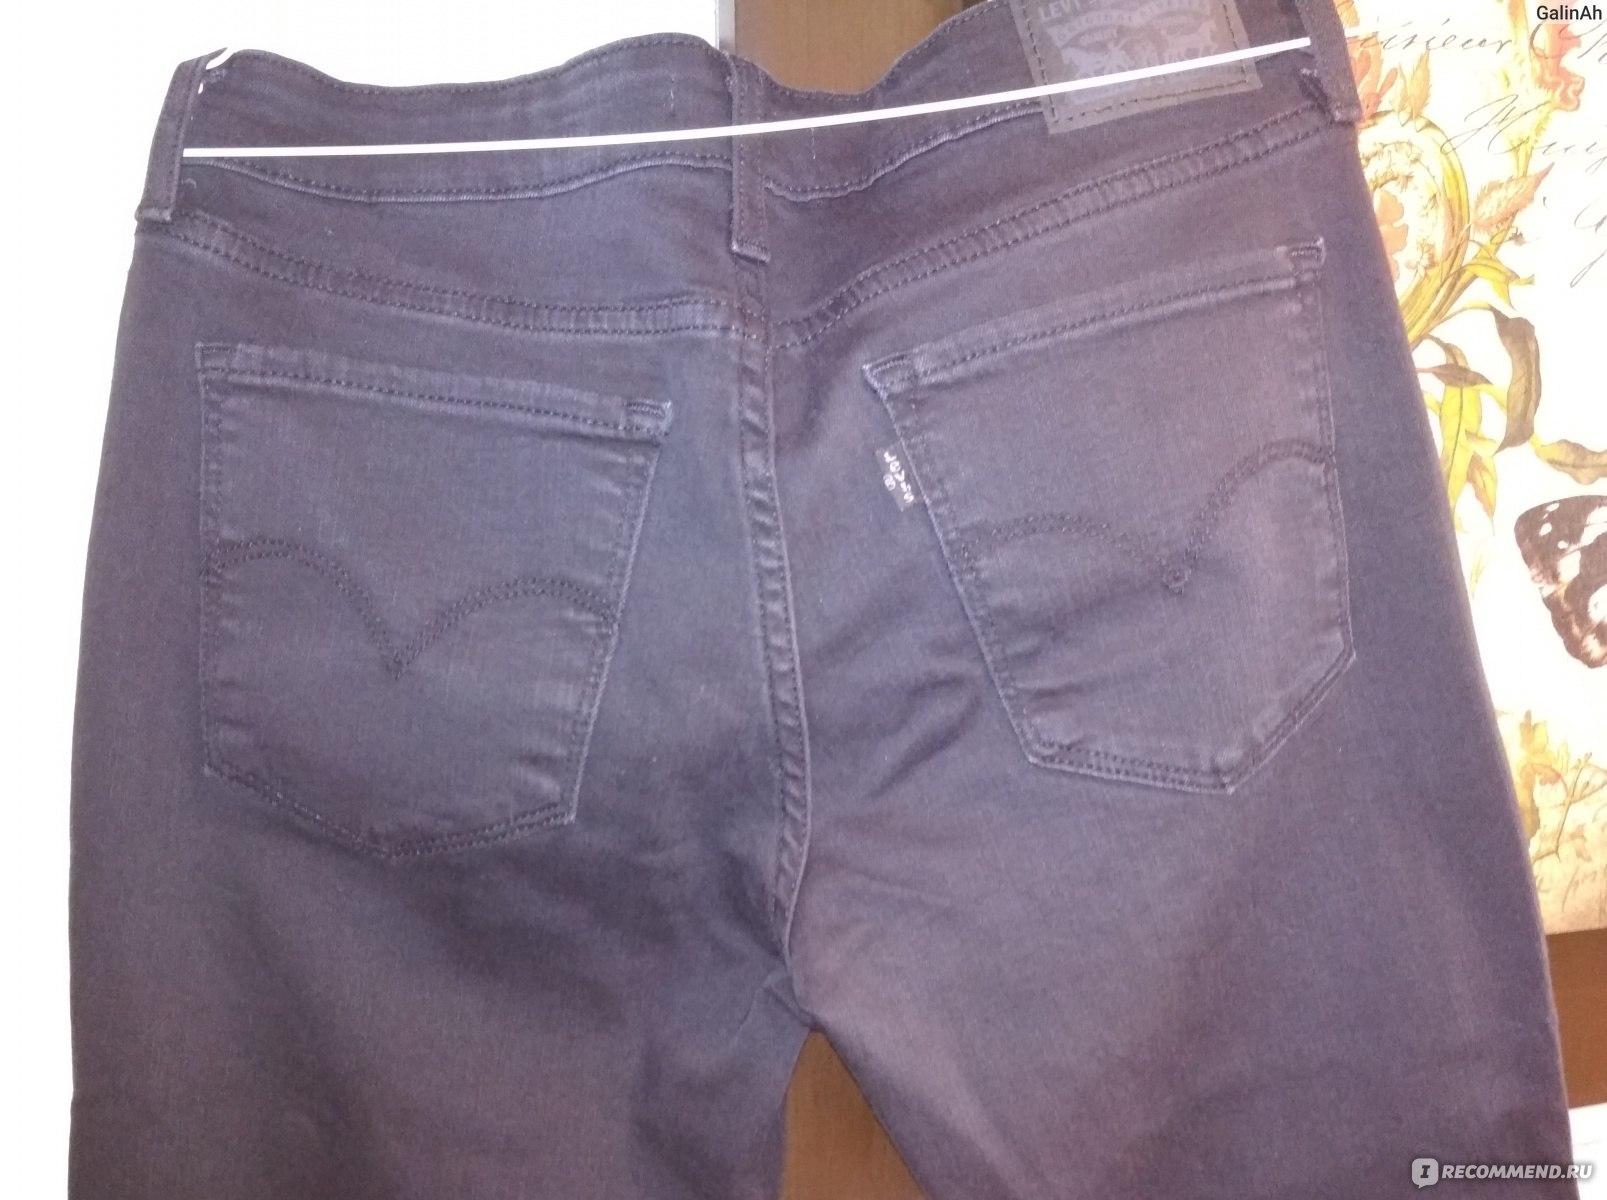 Обои button , Джинсы, Jeans, пуговица, Одежда, clothing. Разное foto 12